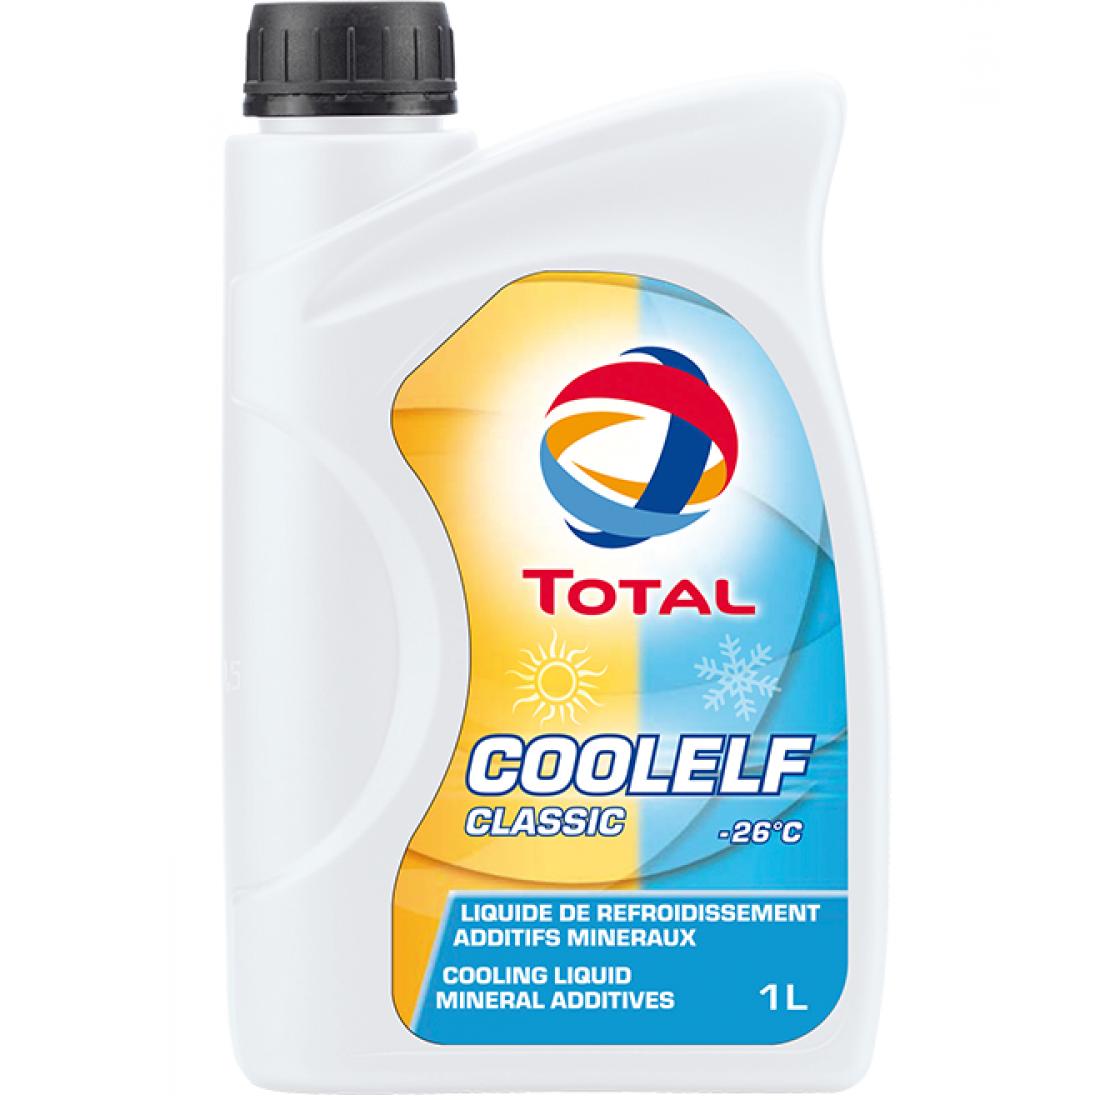 TOTAL-ΠΑΡΑΦΛΟΥ COOLELF CLASSIC -26